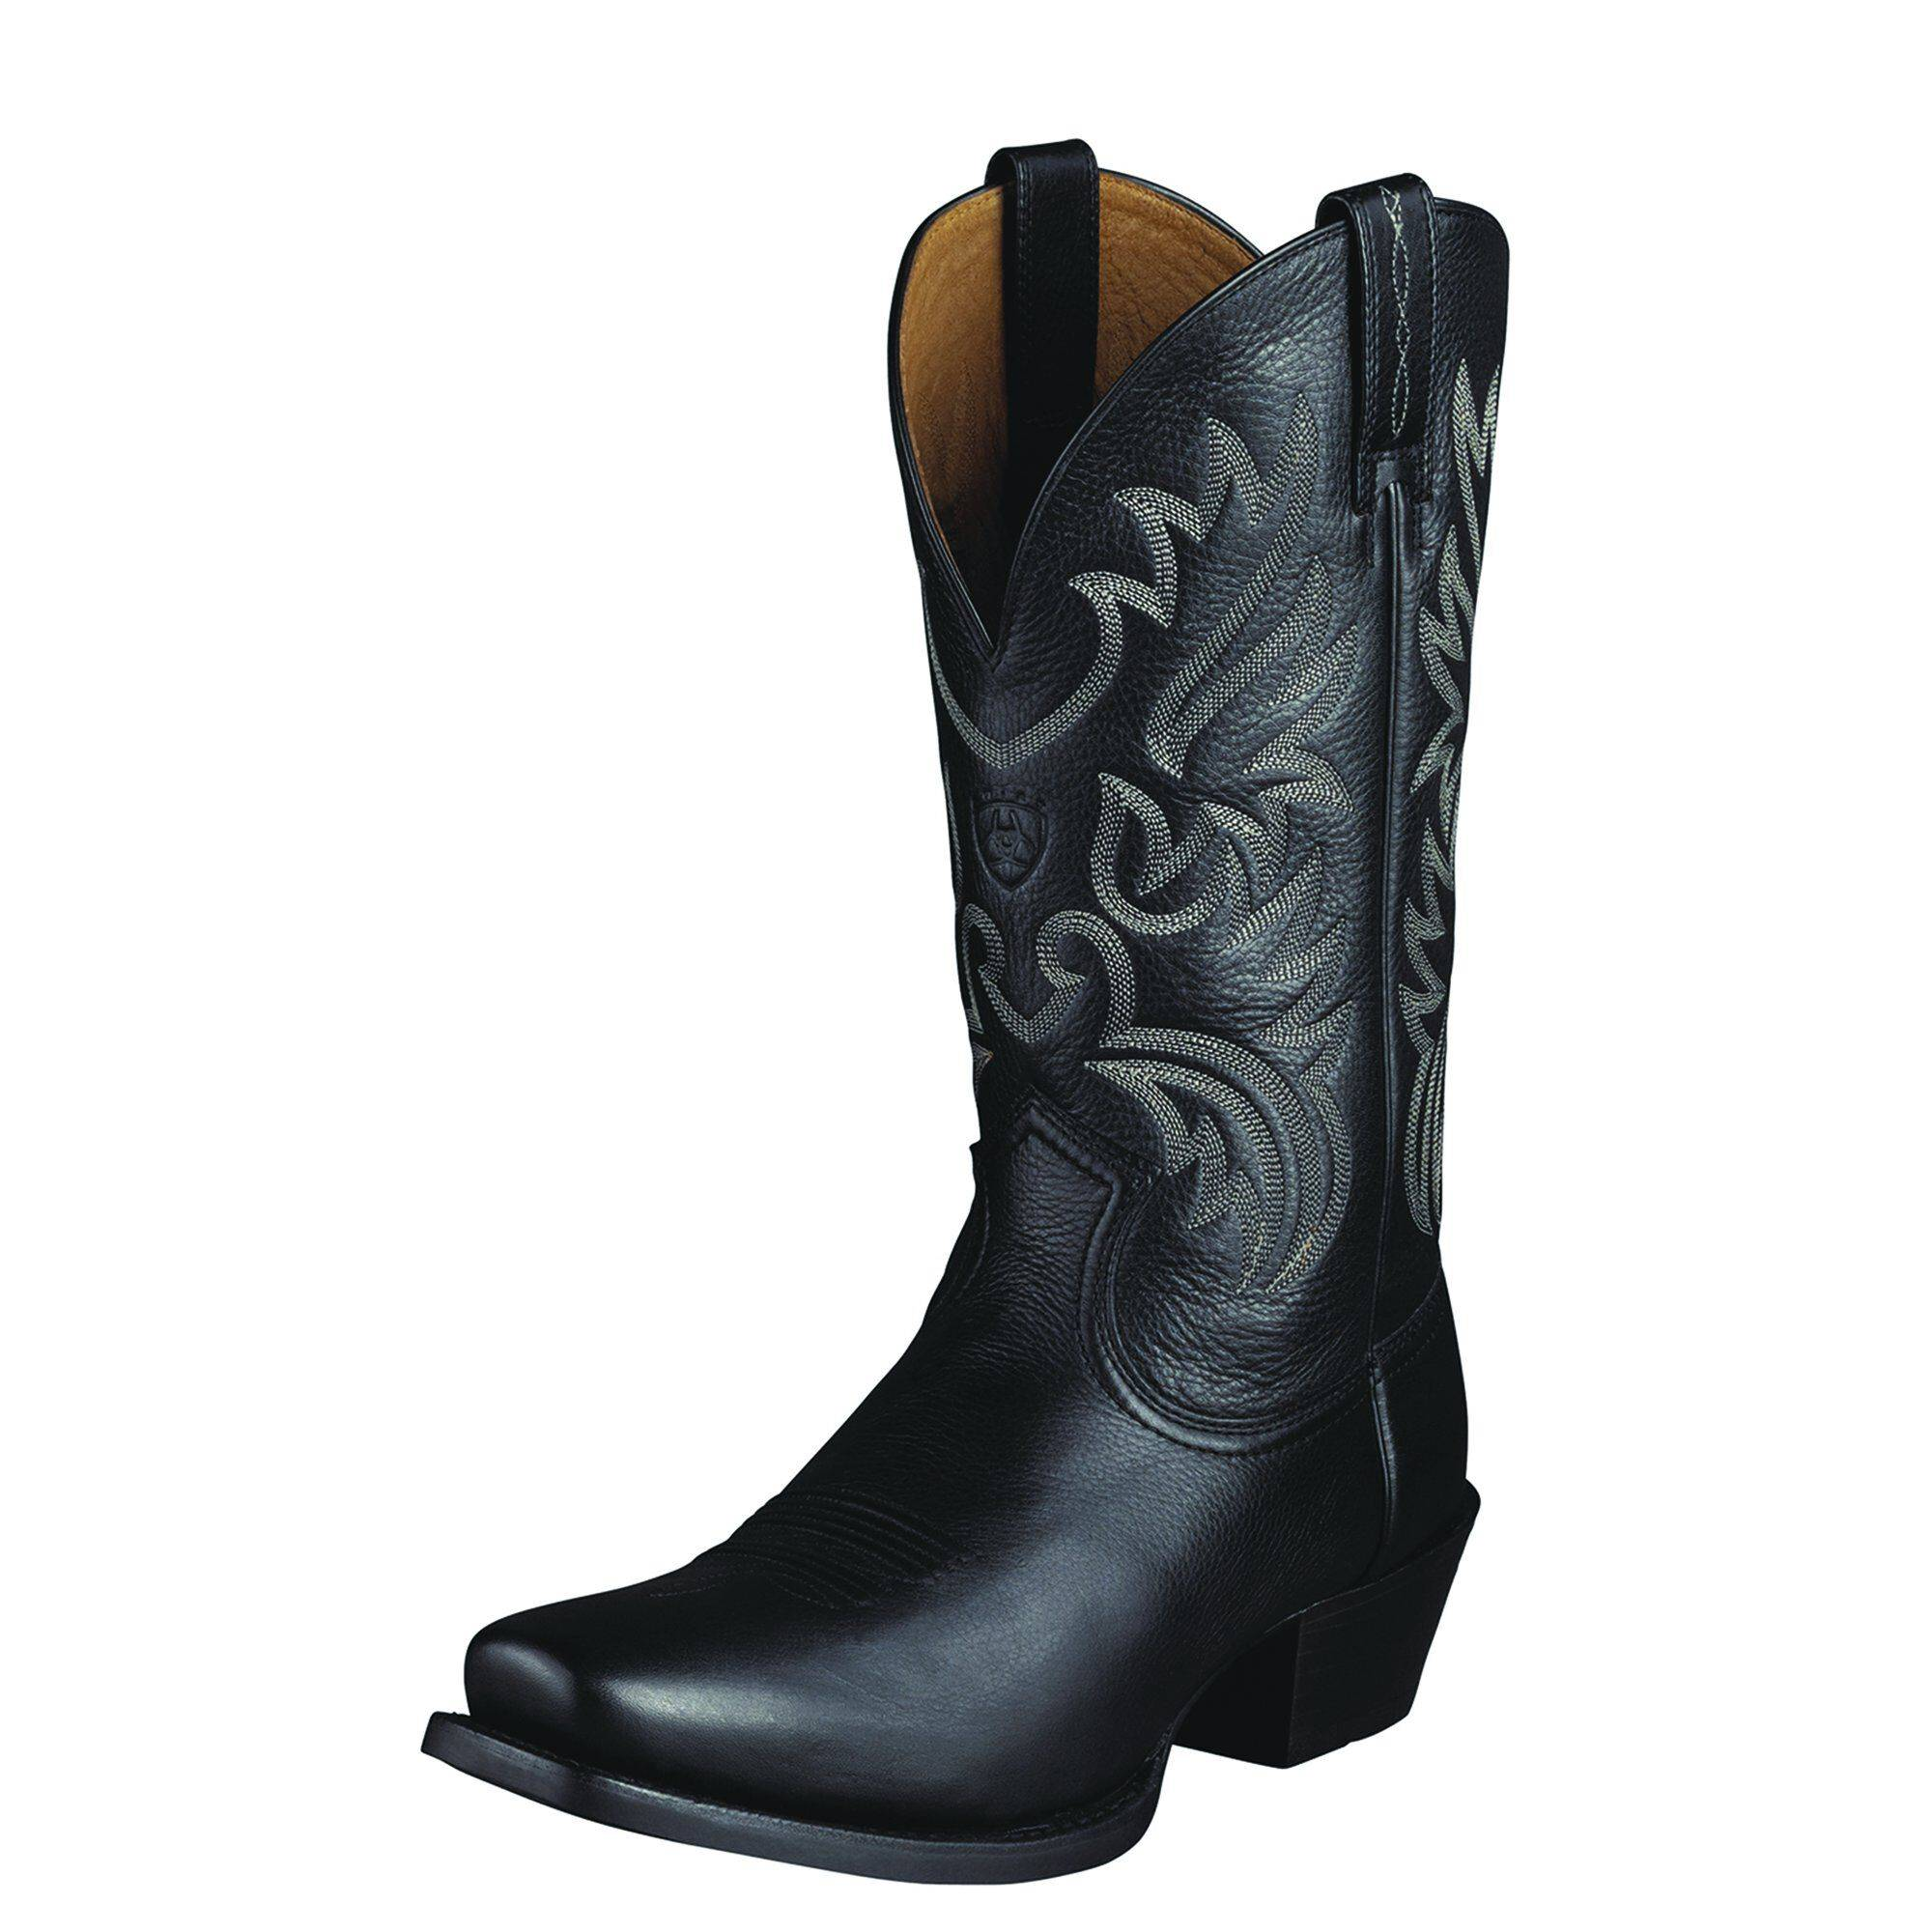 Ariat Men's Legend Western Boots in Black Deertan Leather, Size 11 D / Medium by Ariat